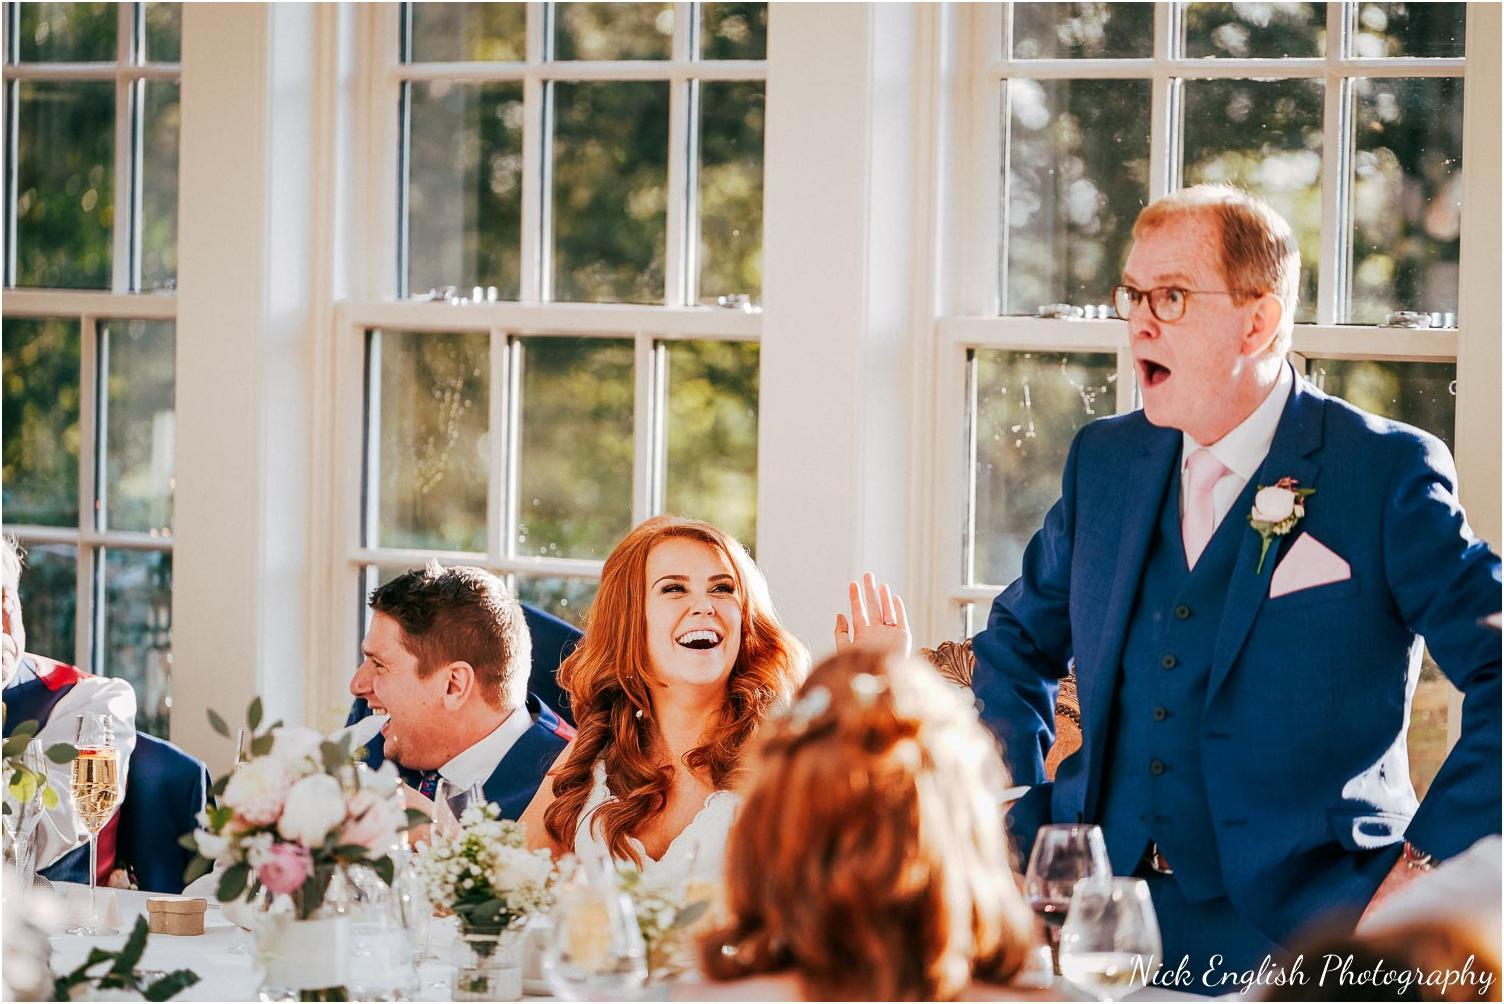 Mitton_Hall_Wedding_Photographer-160.jpg